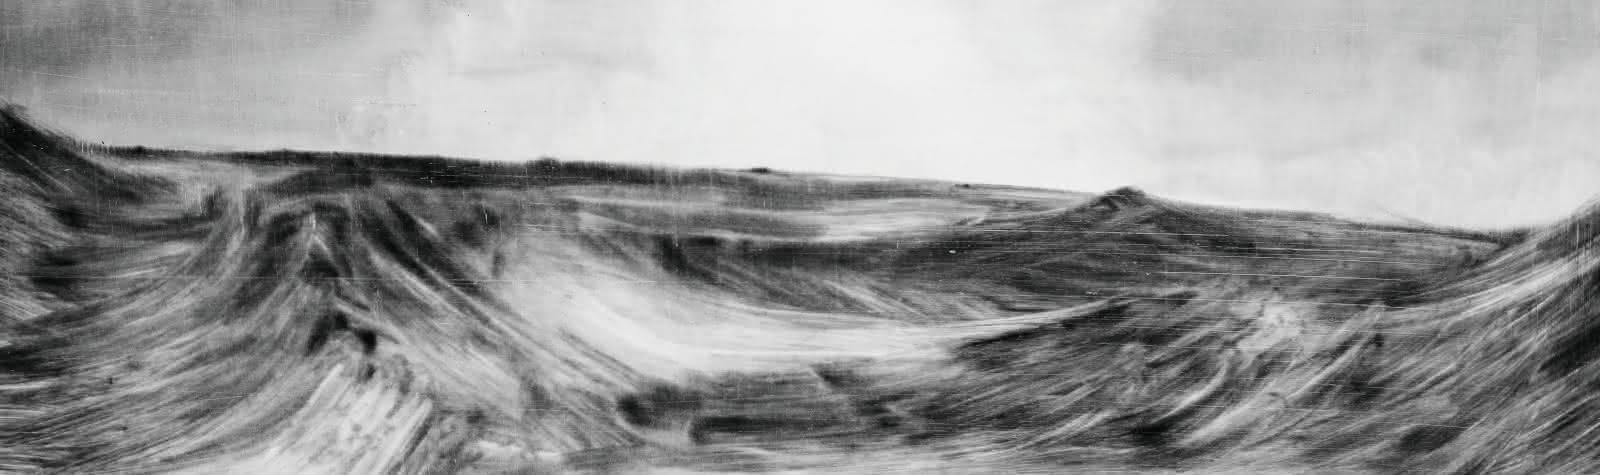 Sea.BAUER/EUSTACHE